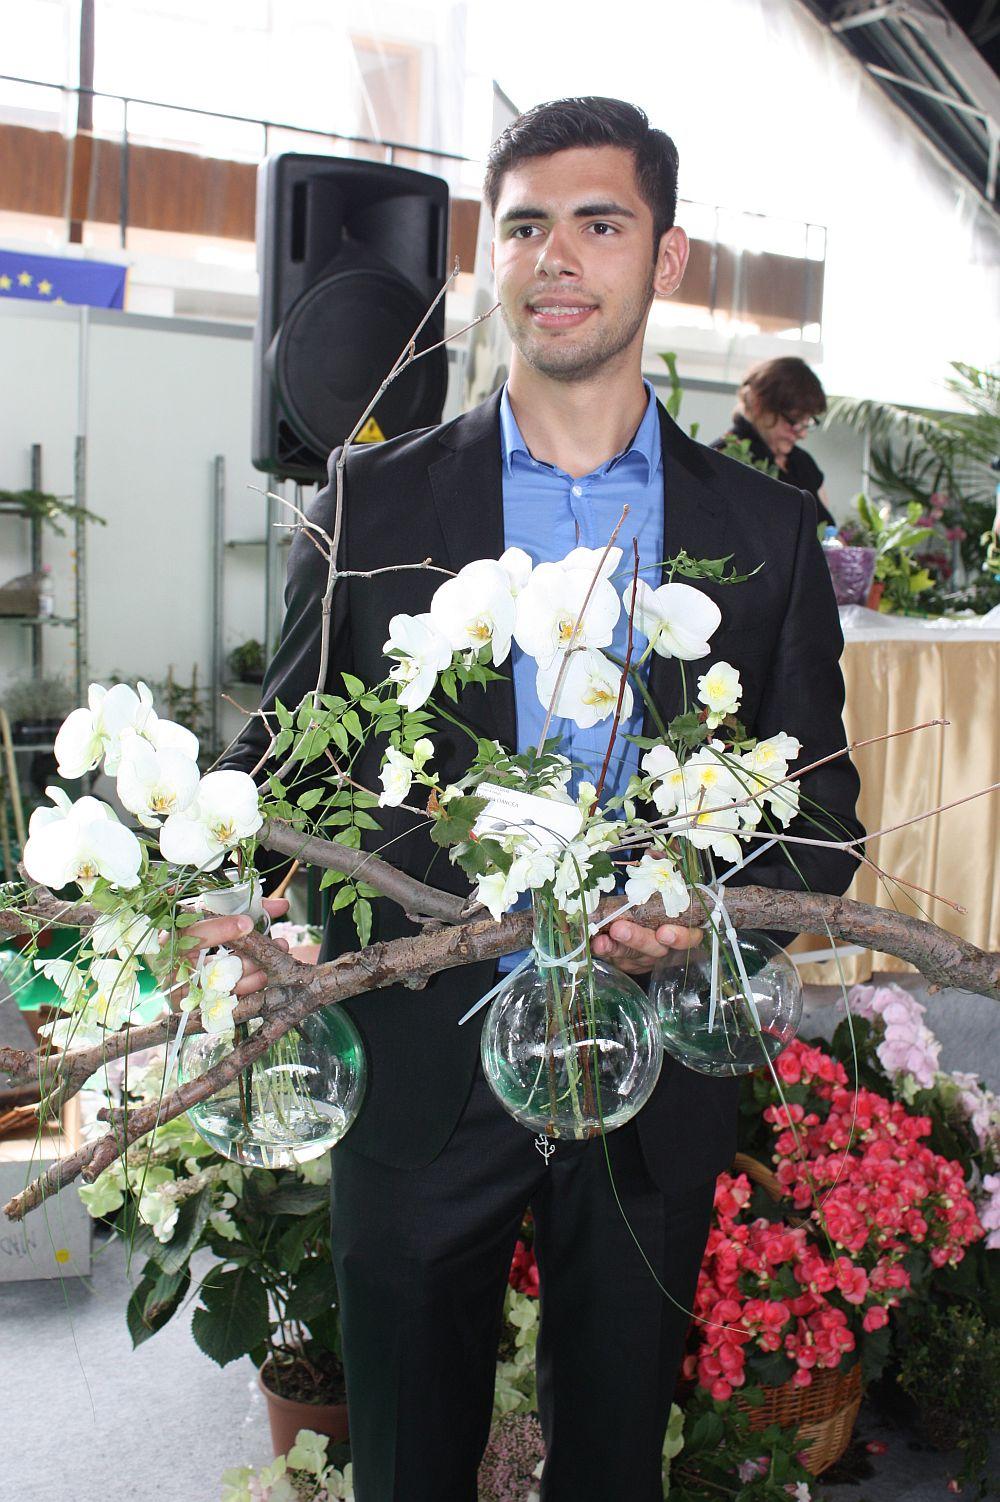 adelaparvu.com despre targul de plante, flori si peisagistica Hartus Florshow 2014 (7)